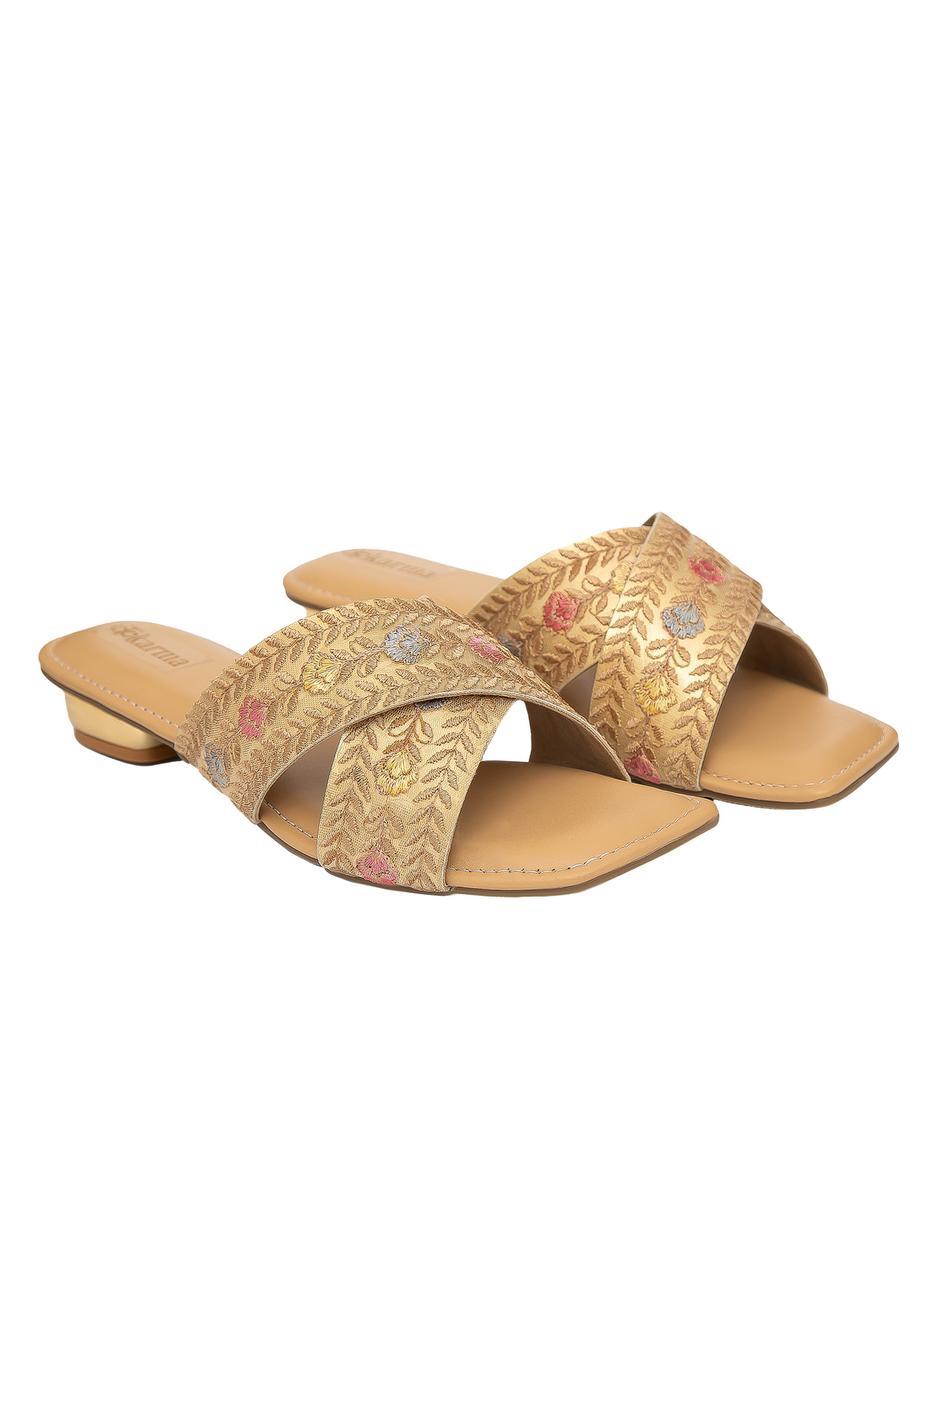 Shabnam Cross Strap Sandals